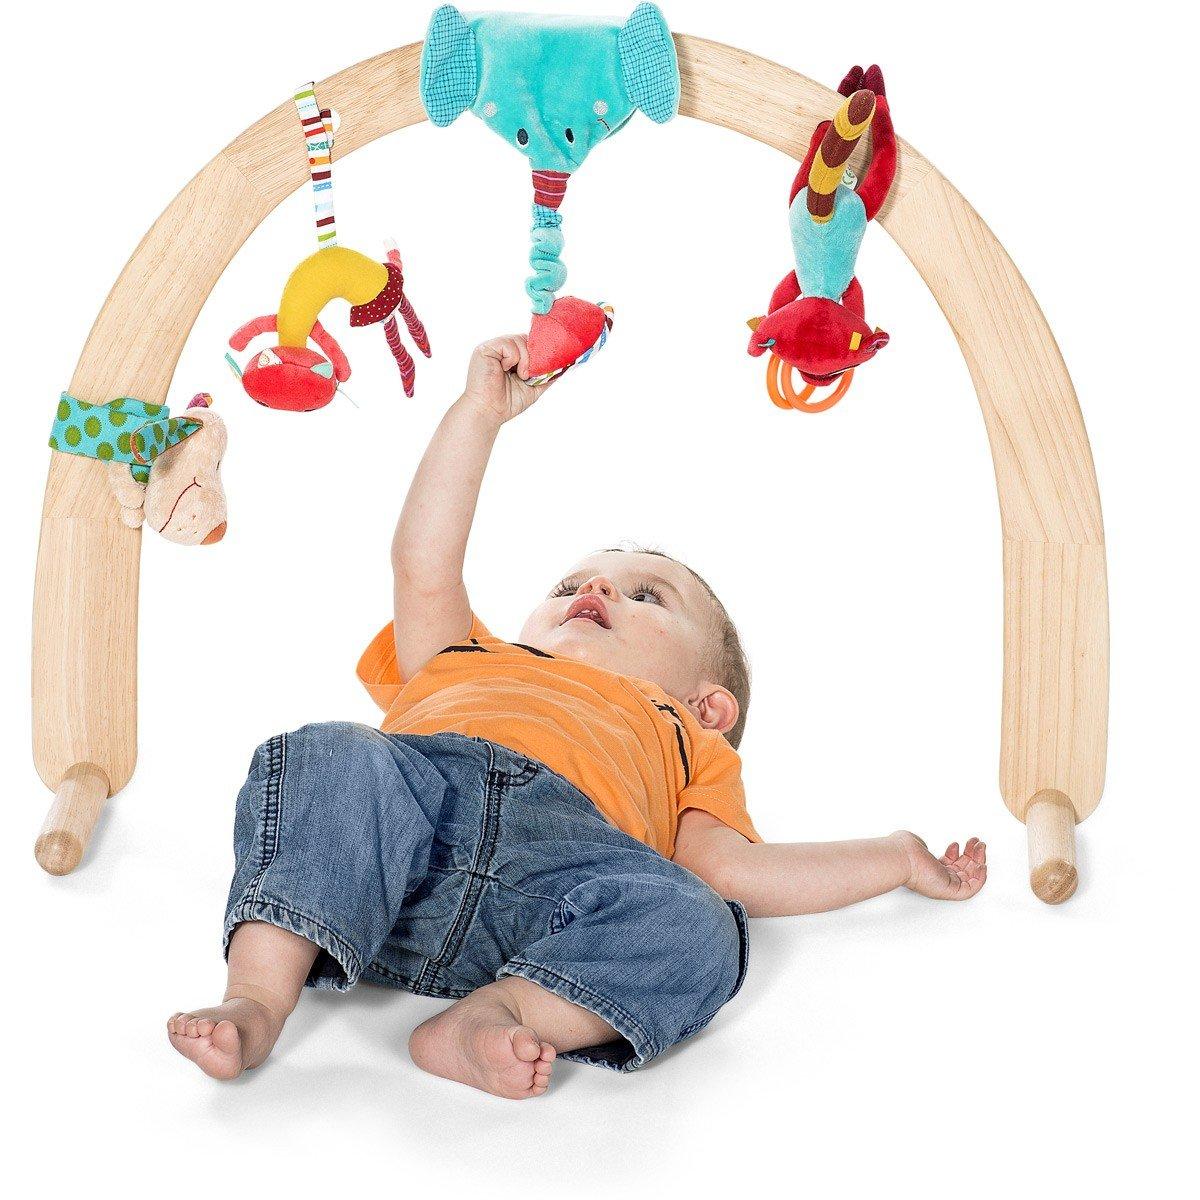 arco de madera - liliputienses Lilliputiens 86636